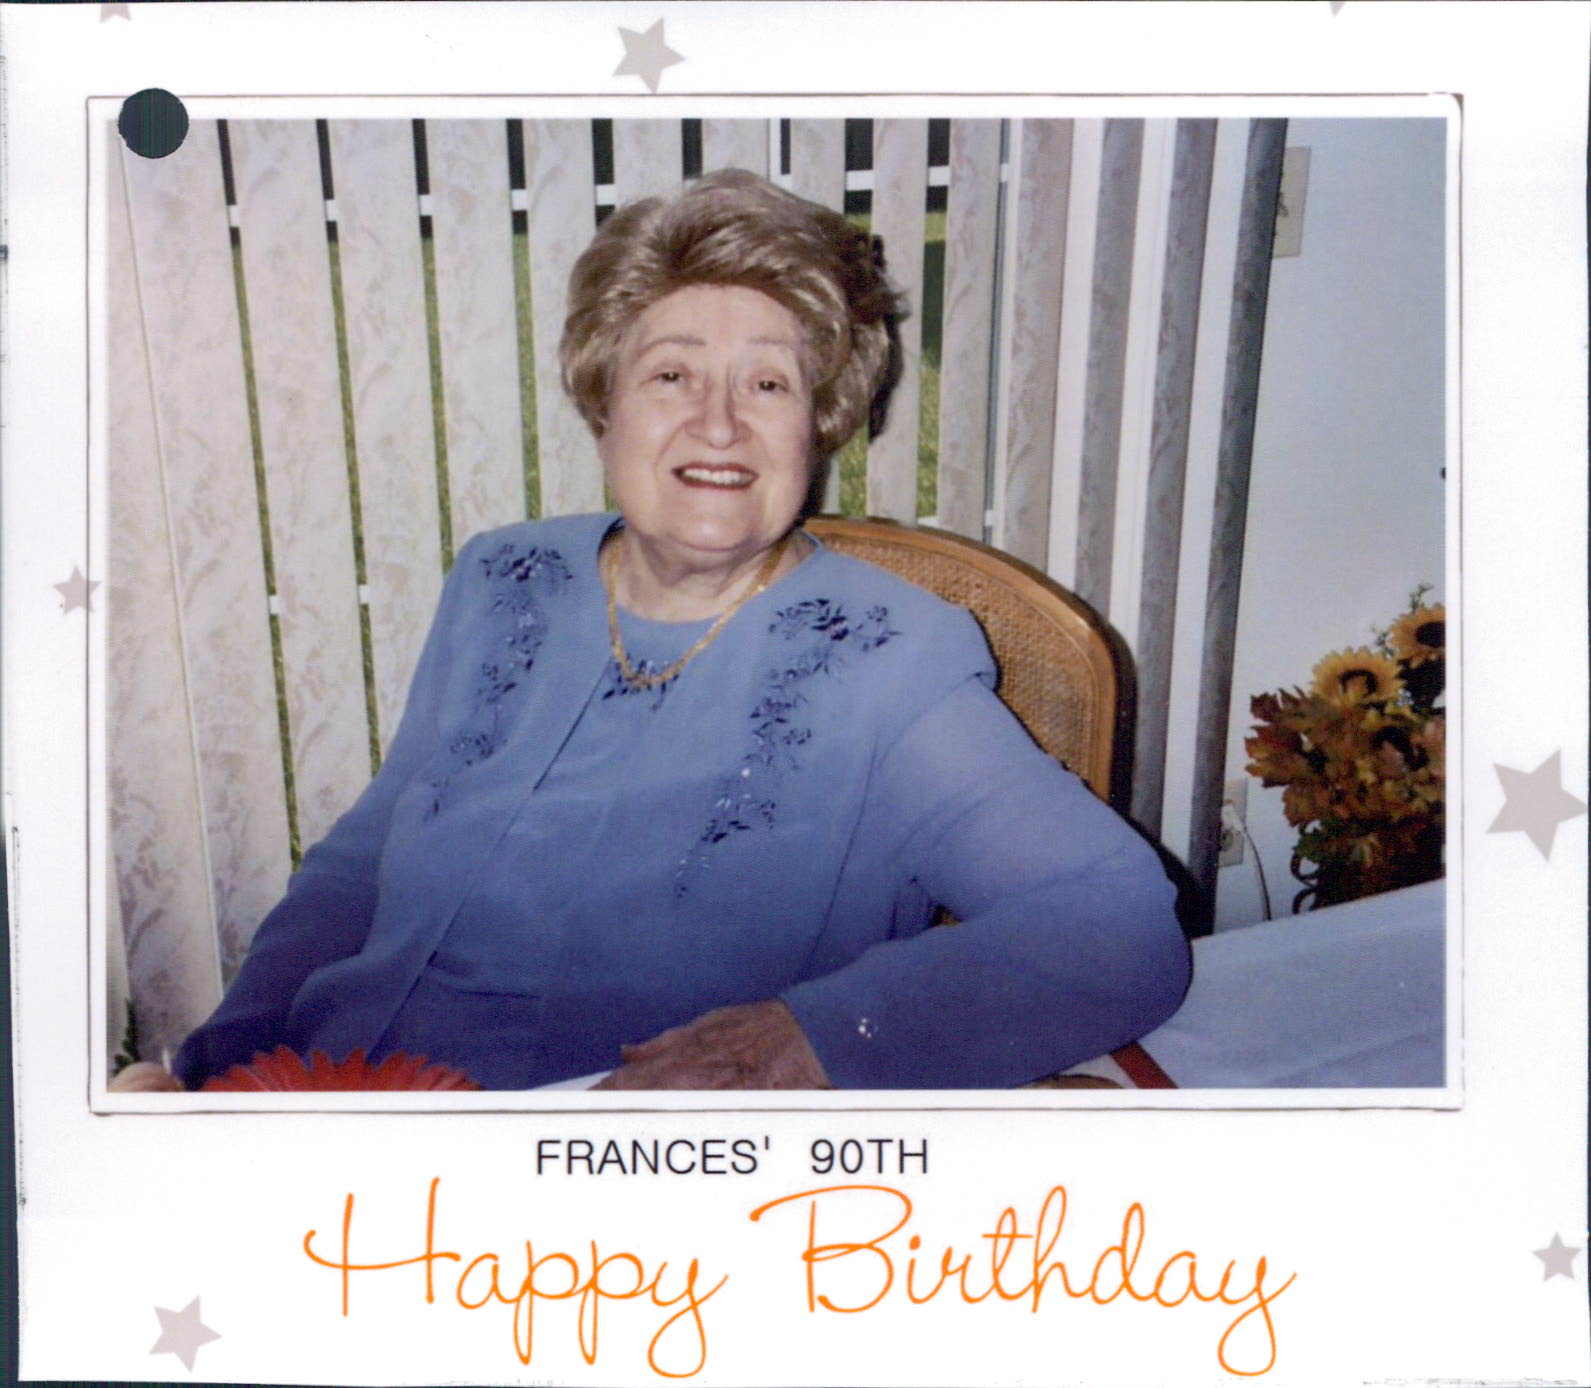 Frances A. Farinella